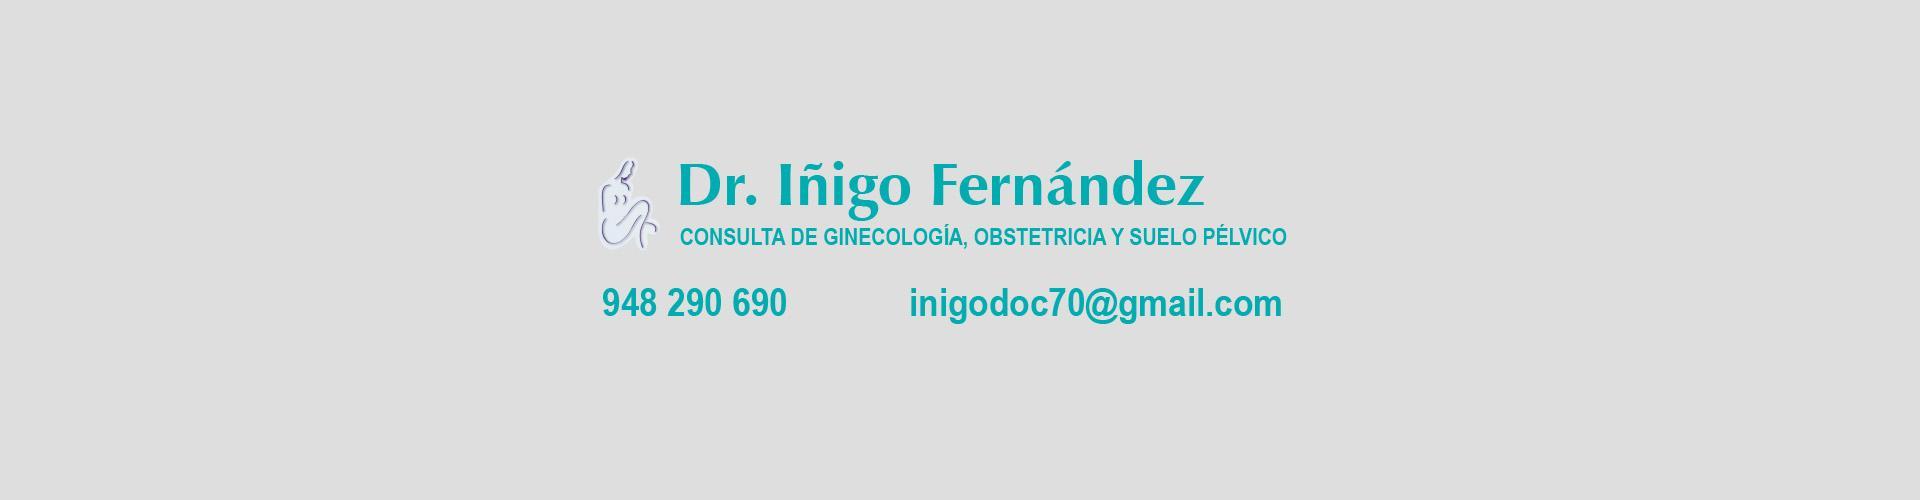 Dr. Iñigo Fernández